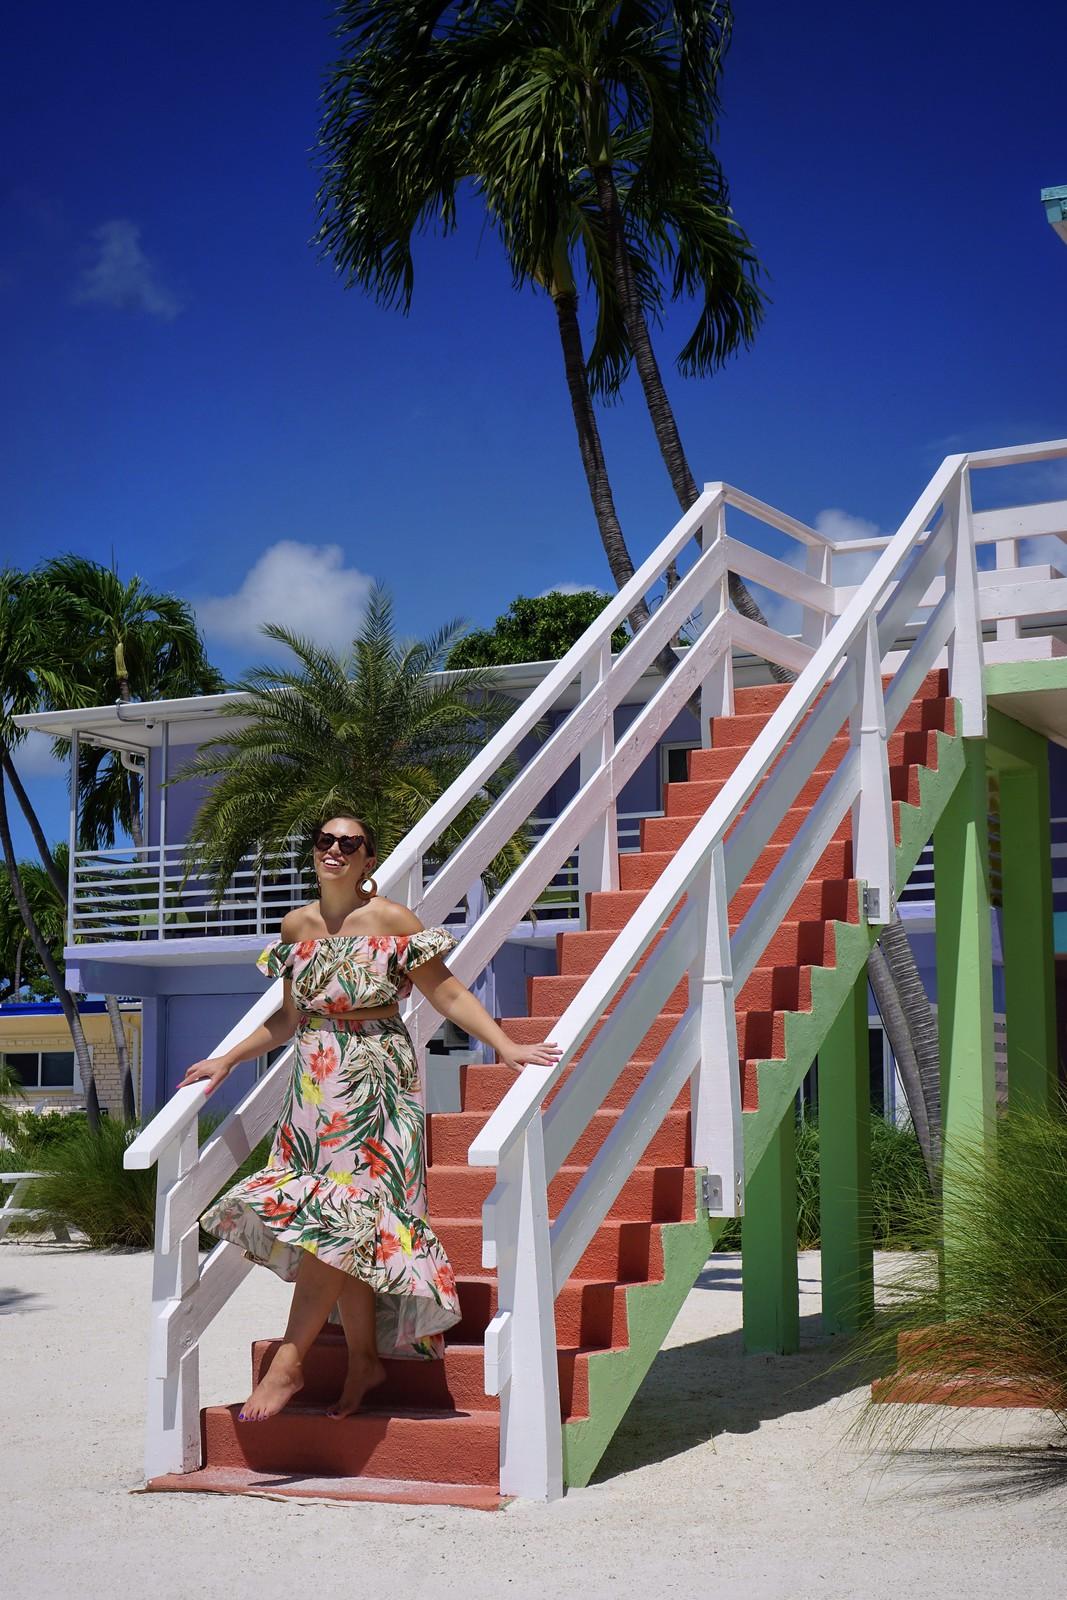 drop-anchor-resort-rainbow-ultimate-road-trip-5-days-florida-keys-itinerary-what-to-do-key-west-key-largo-islamorada-marathon-miami-vacation-guide